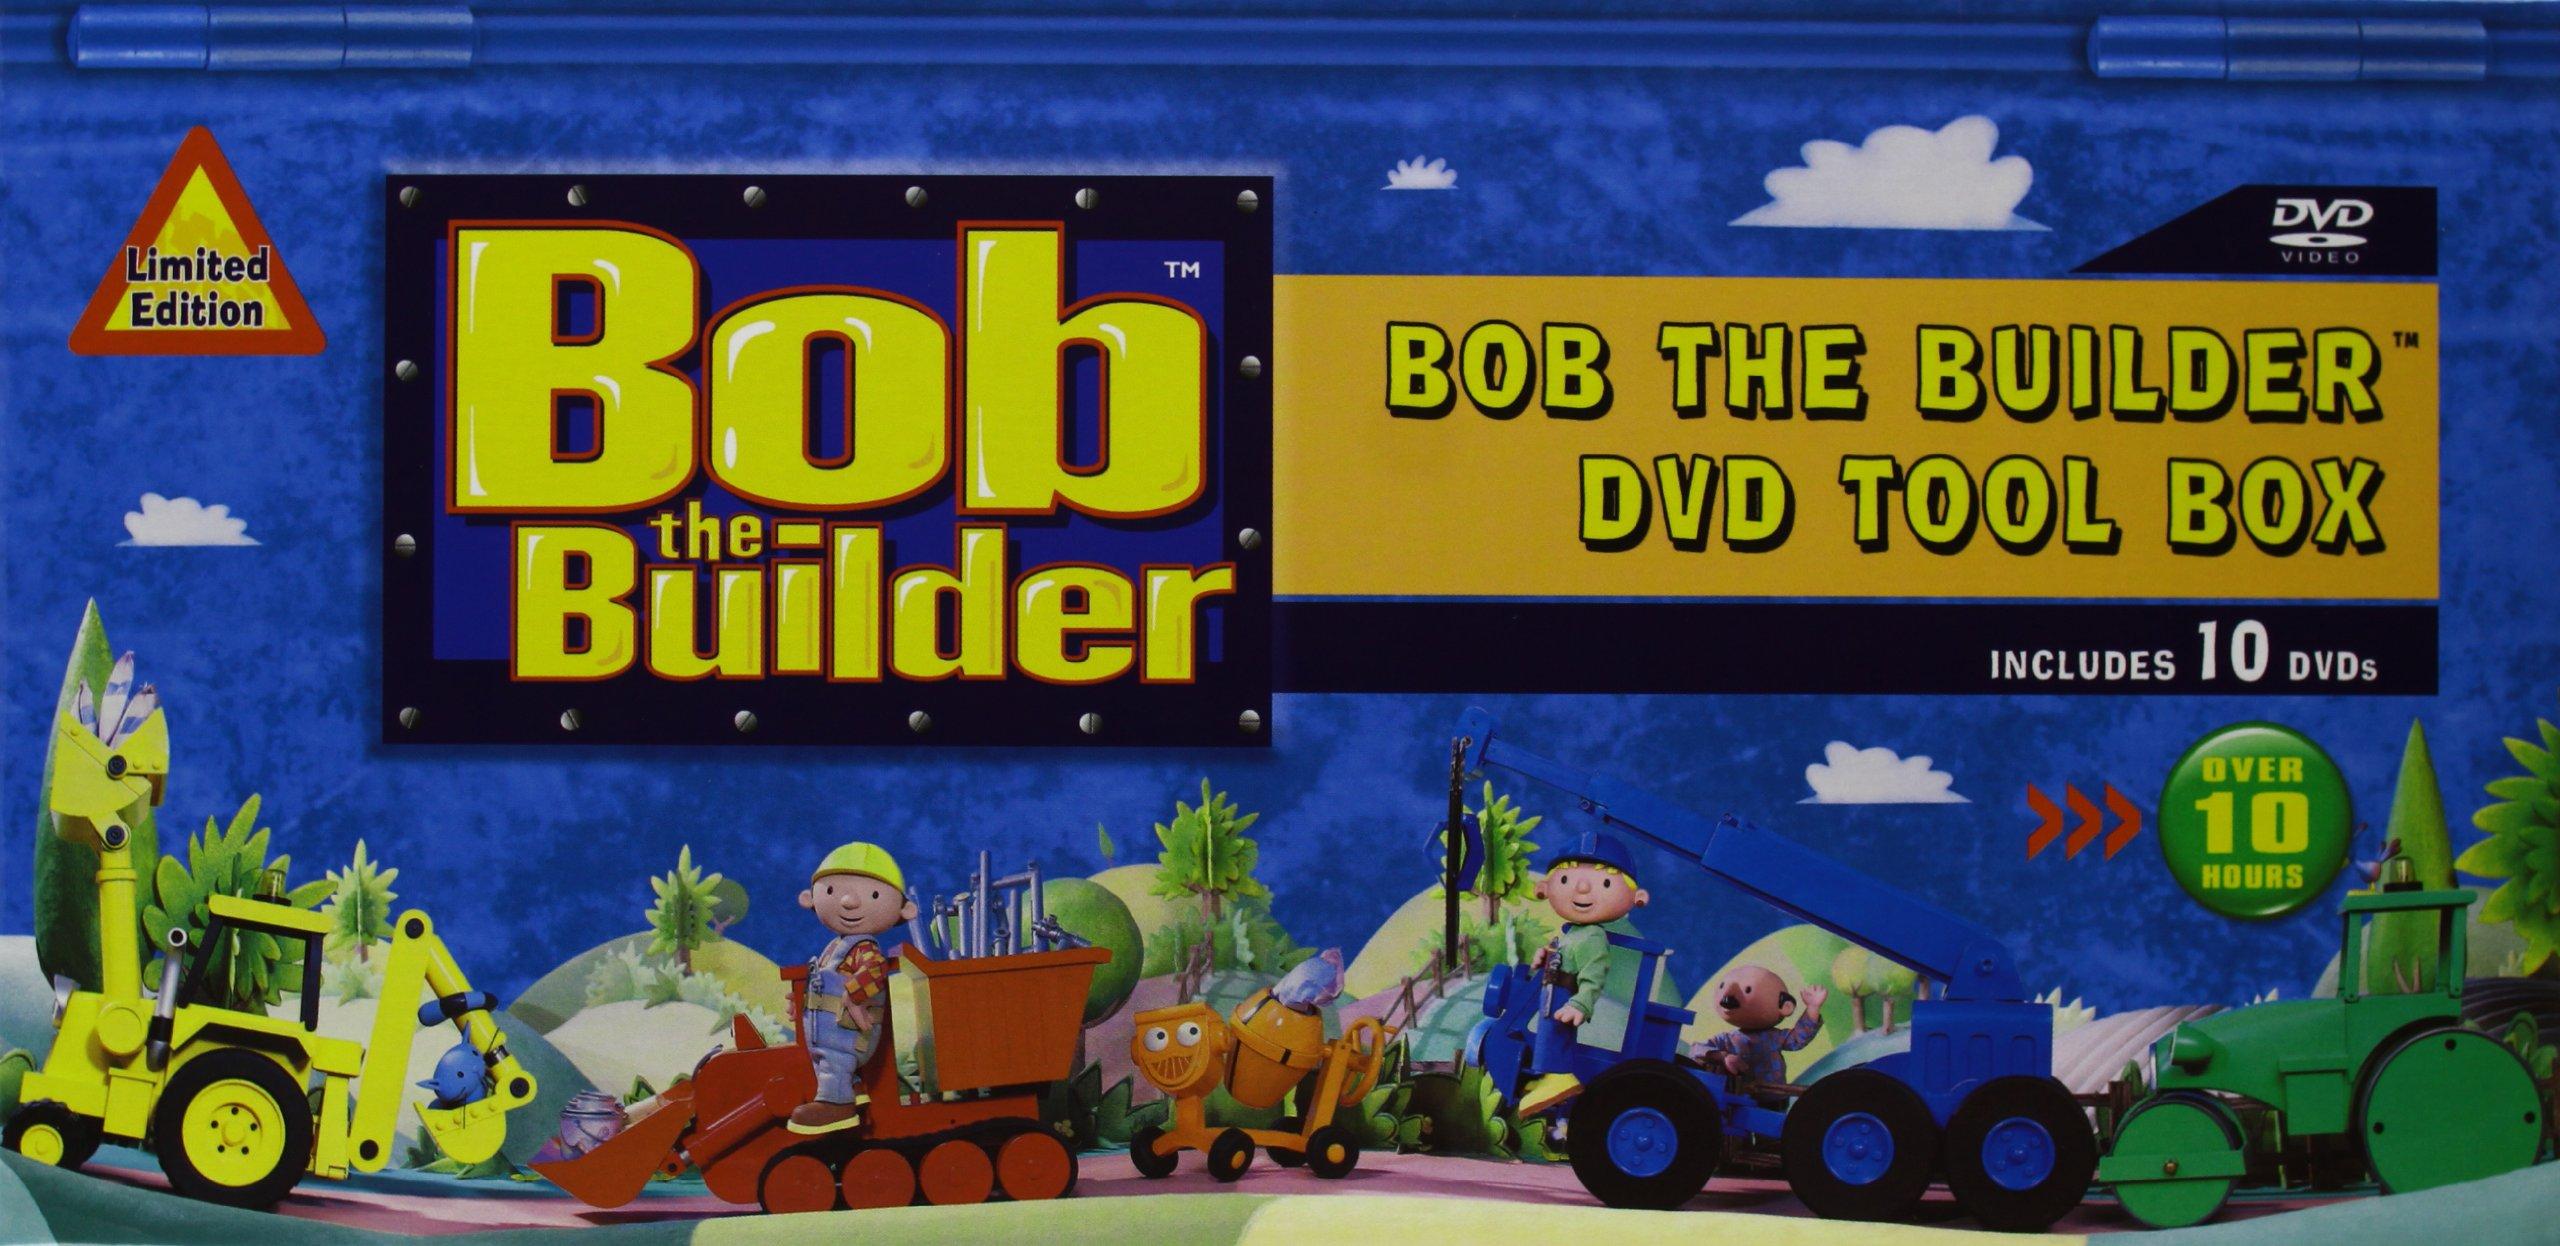 Bob The Builder Dvd Trailer Travis Dvd: Bob The Builder - DVD Tool Box Set